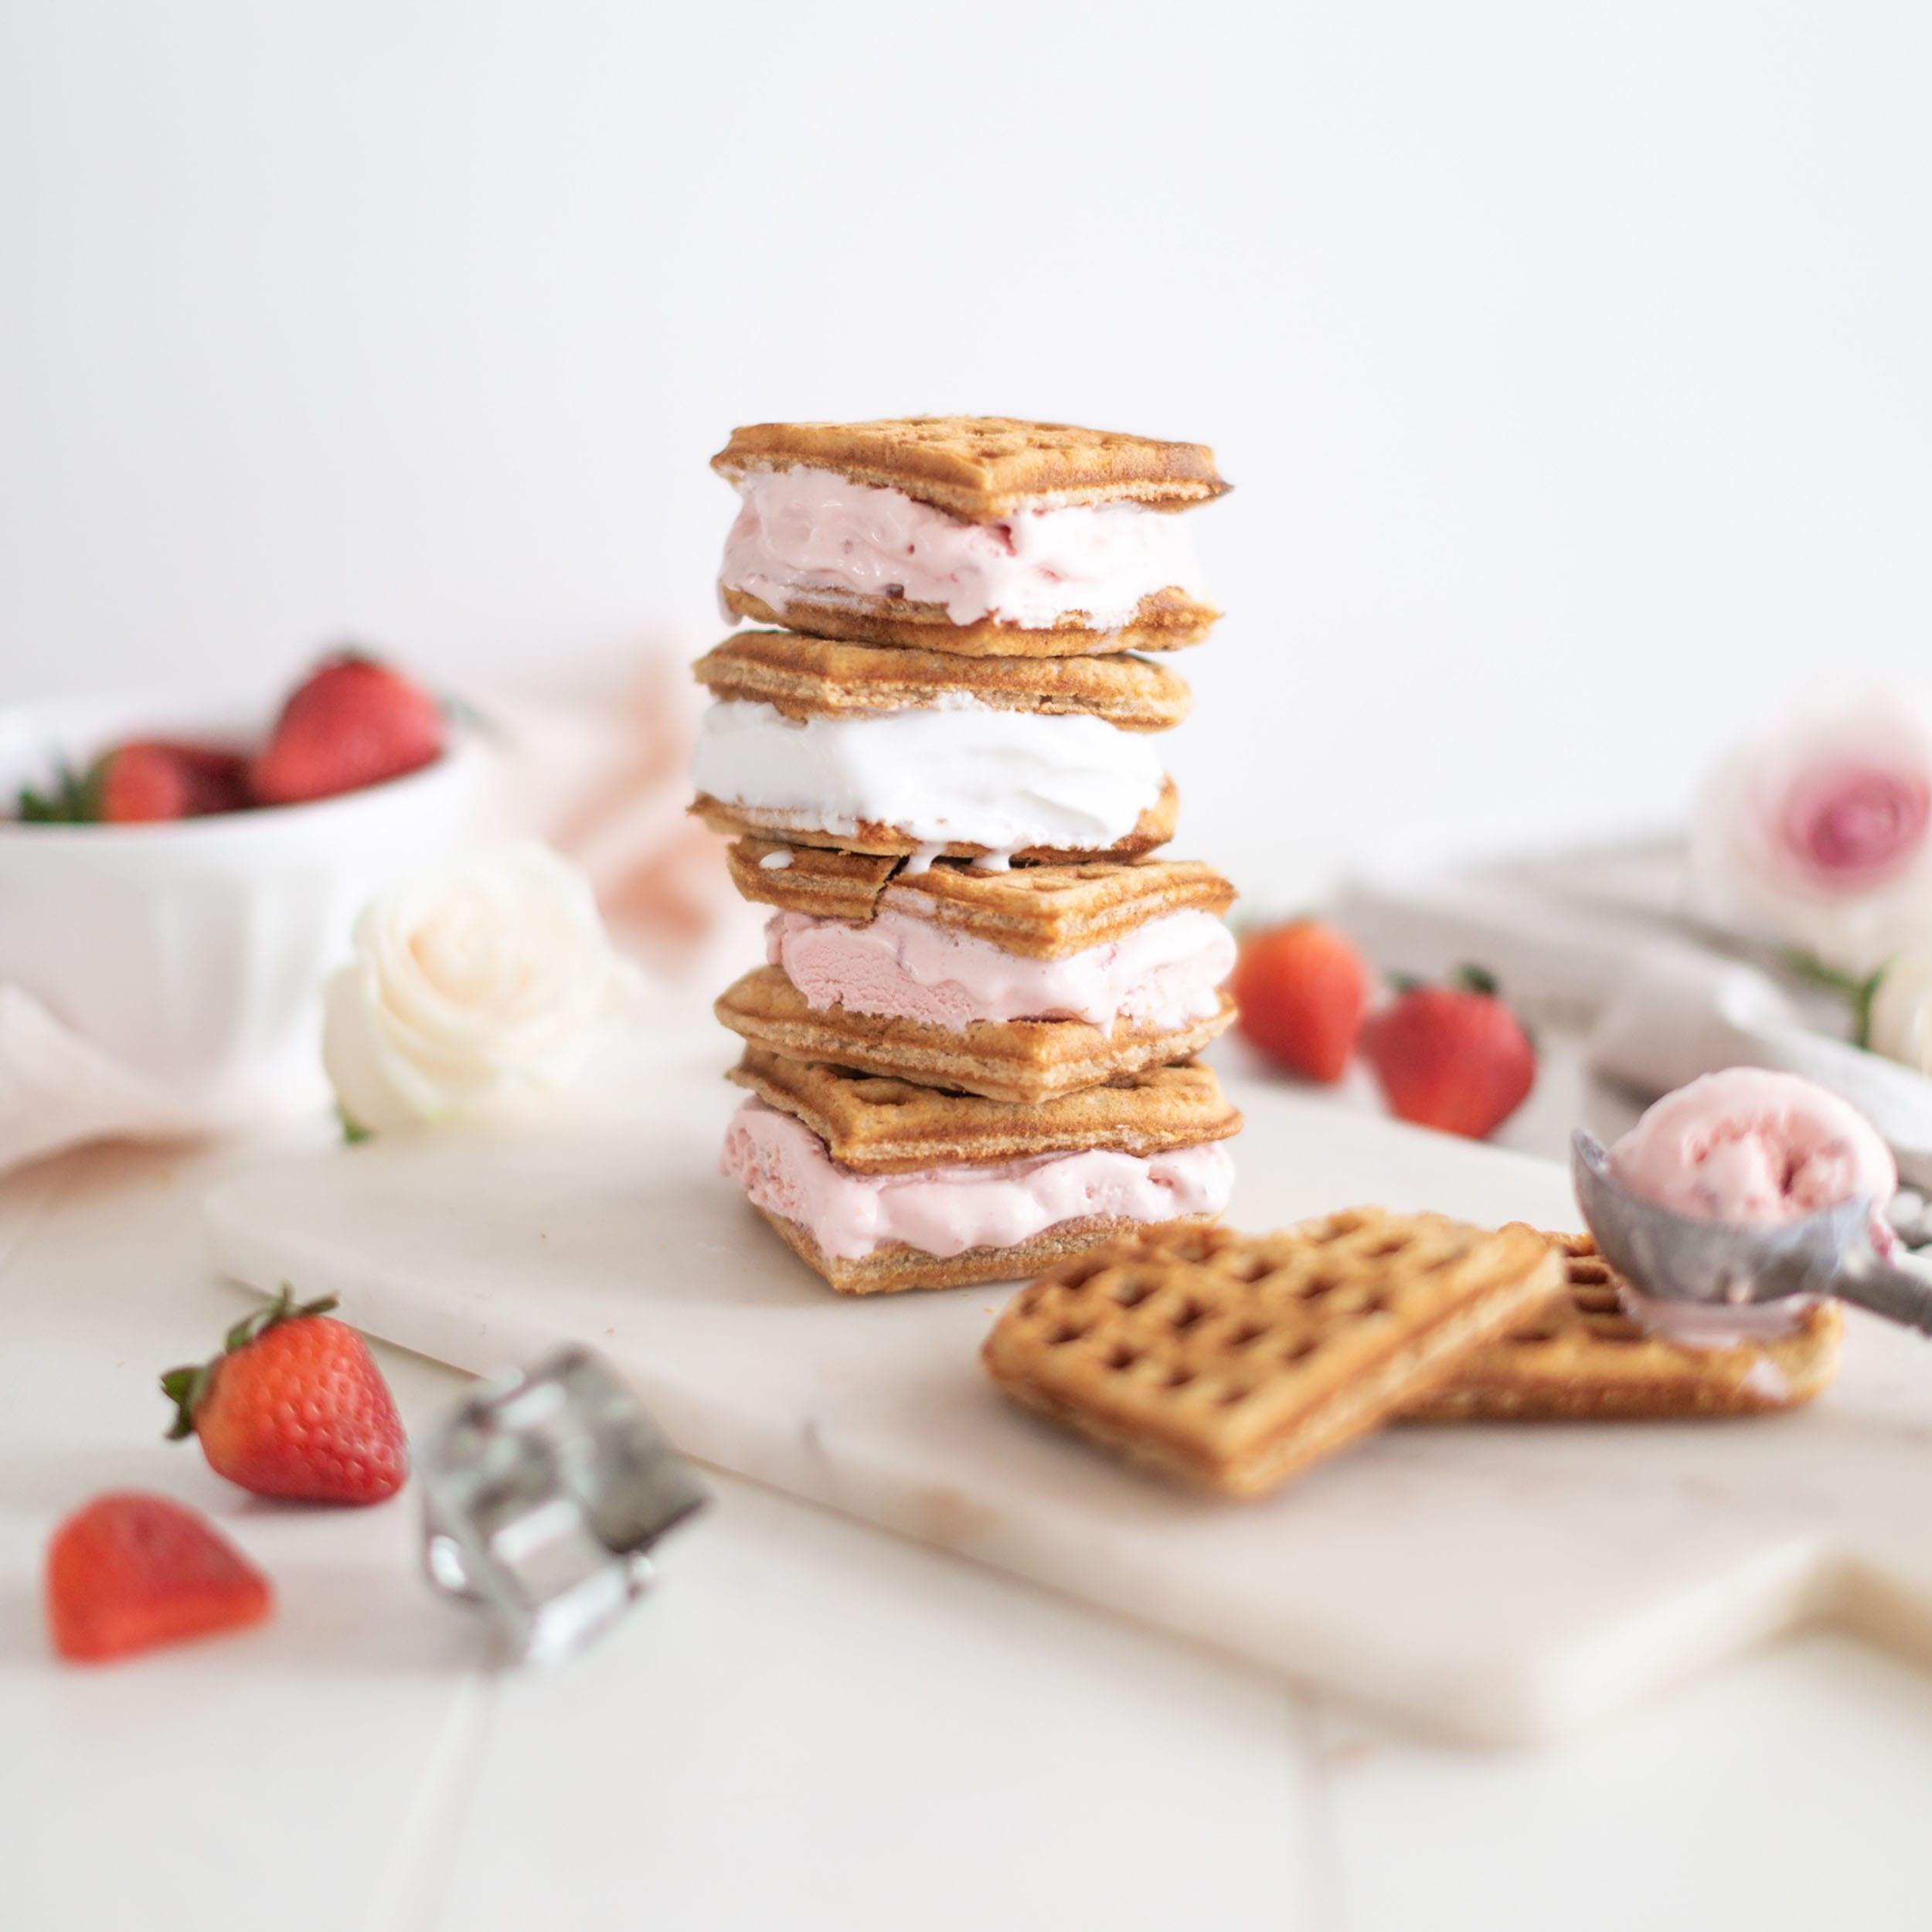 Valentine's Heart Waffle Ice Cream Sandwiches